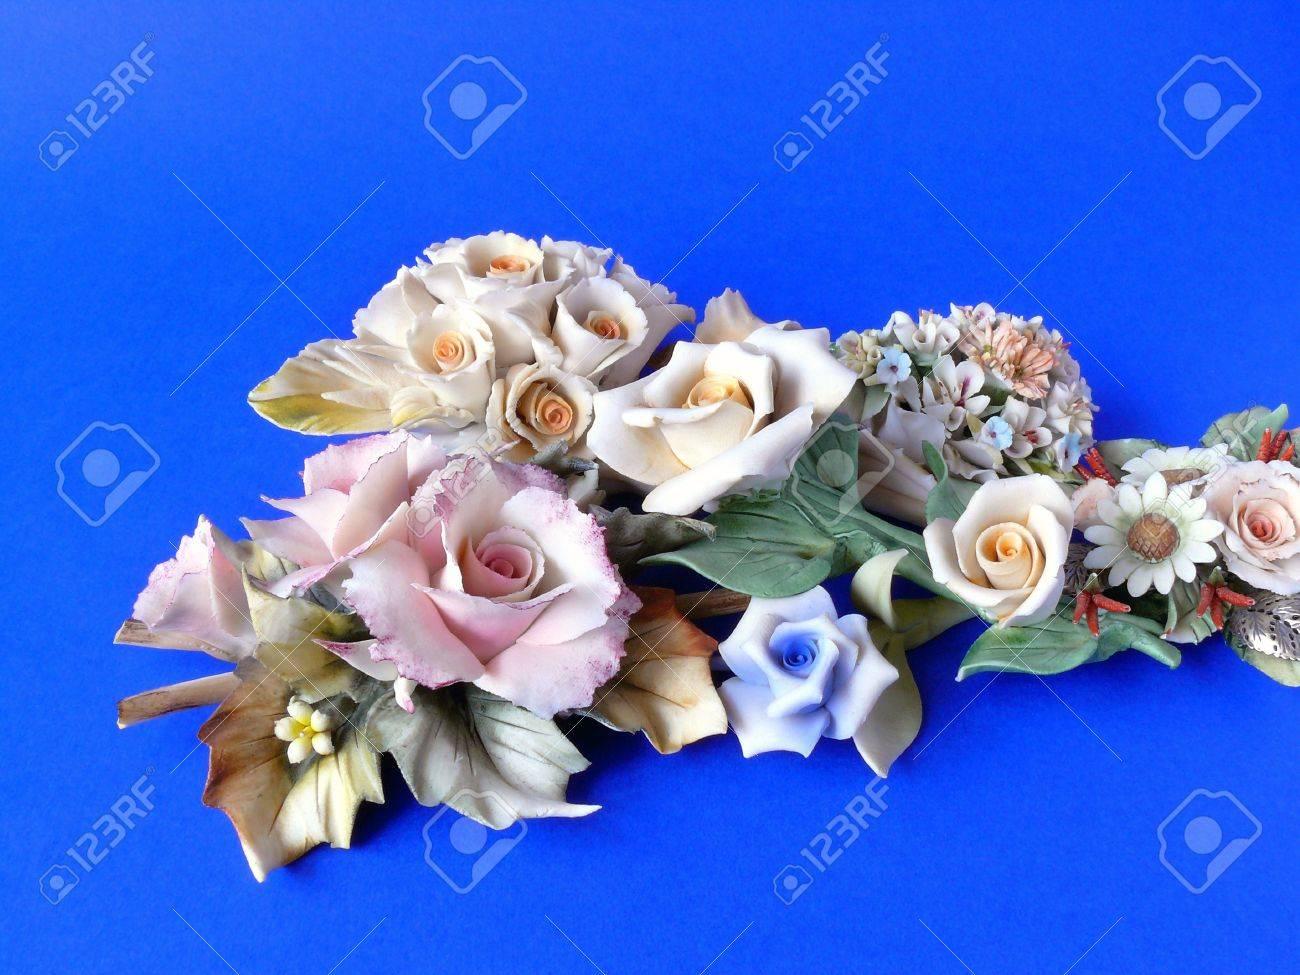 Bunch of ornamental ceramic flowers (like Capodimonte) isolated on blue Standard-Bild - 4464834